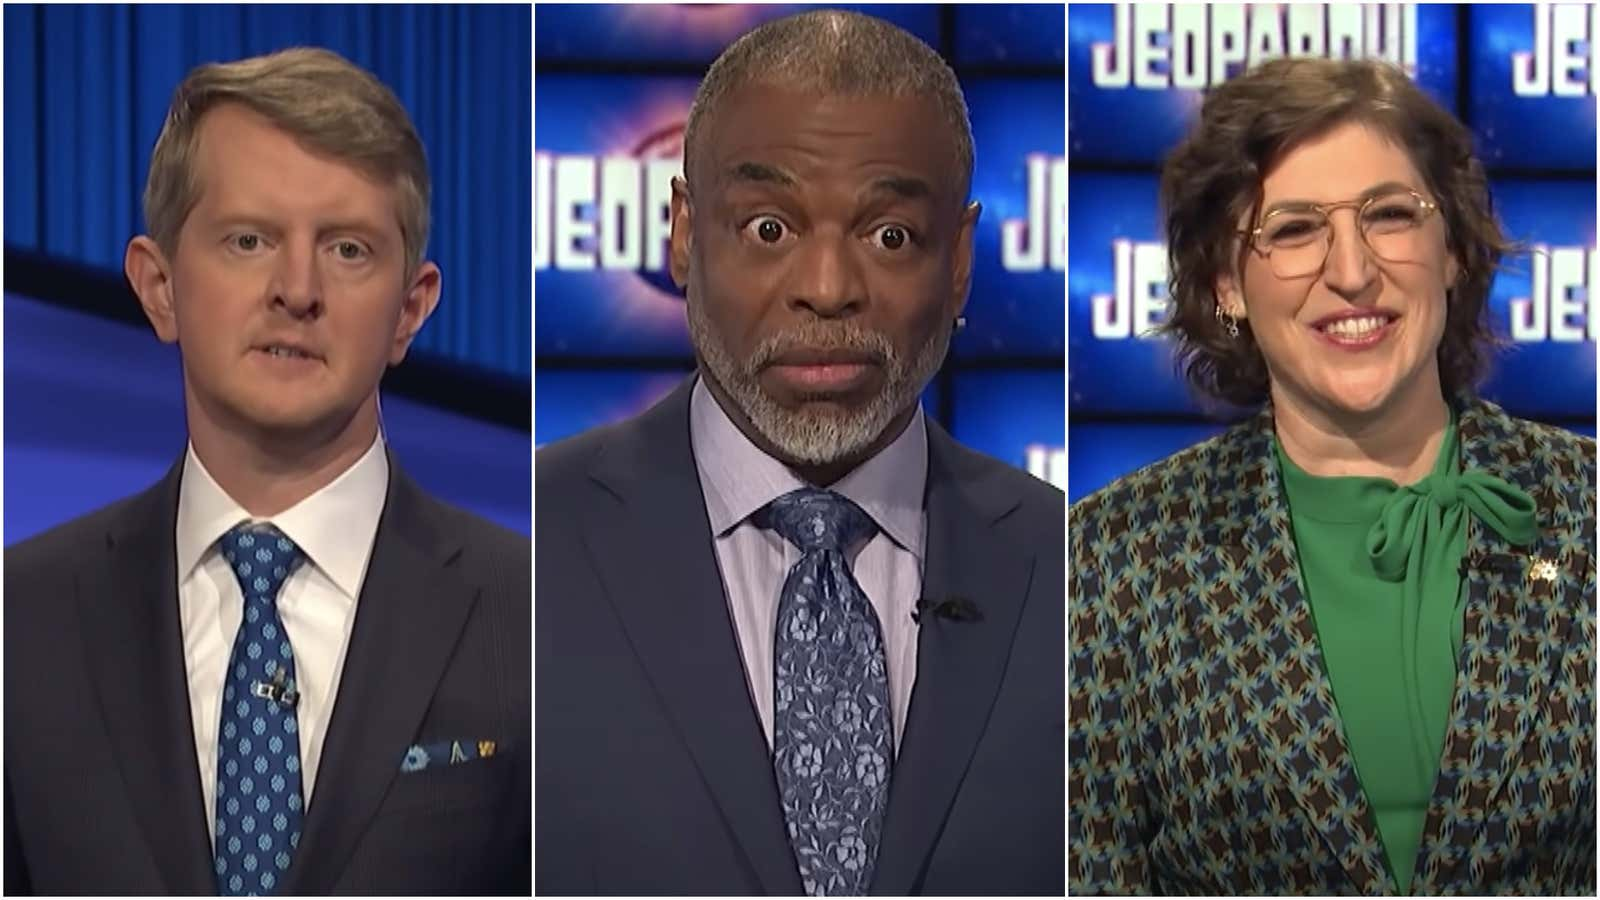 Jeopardy Hosts